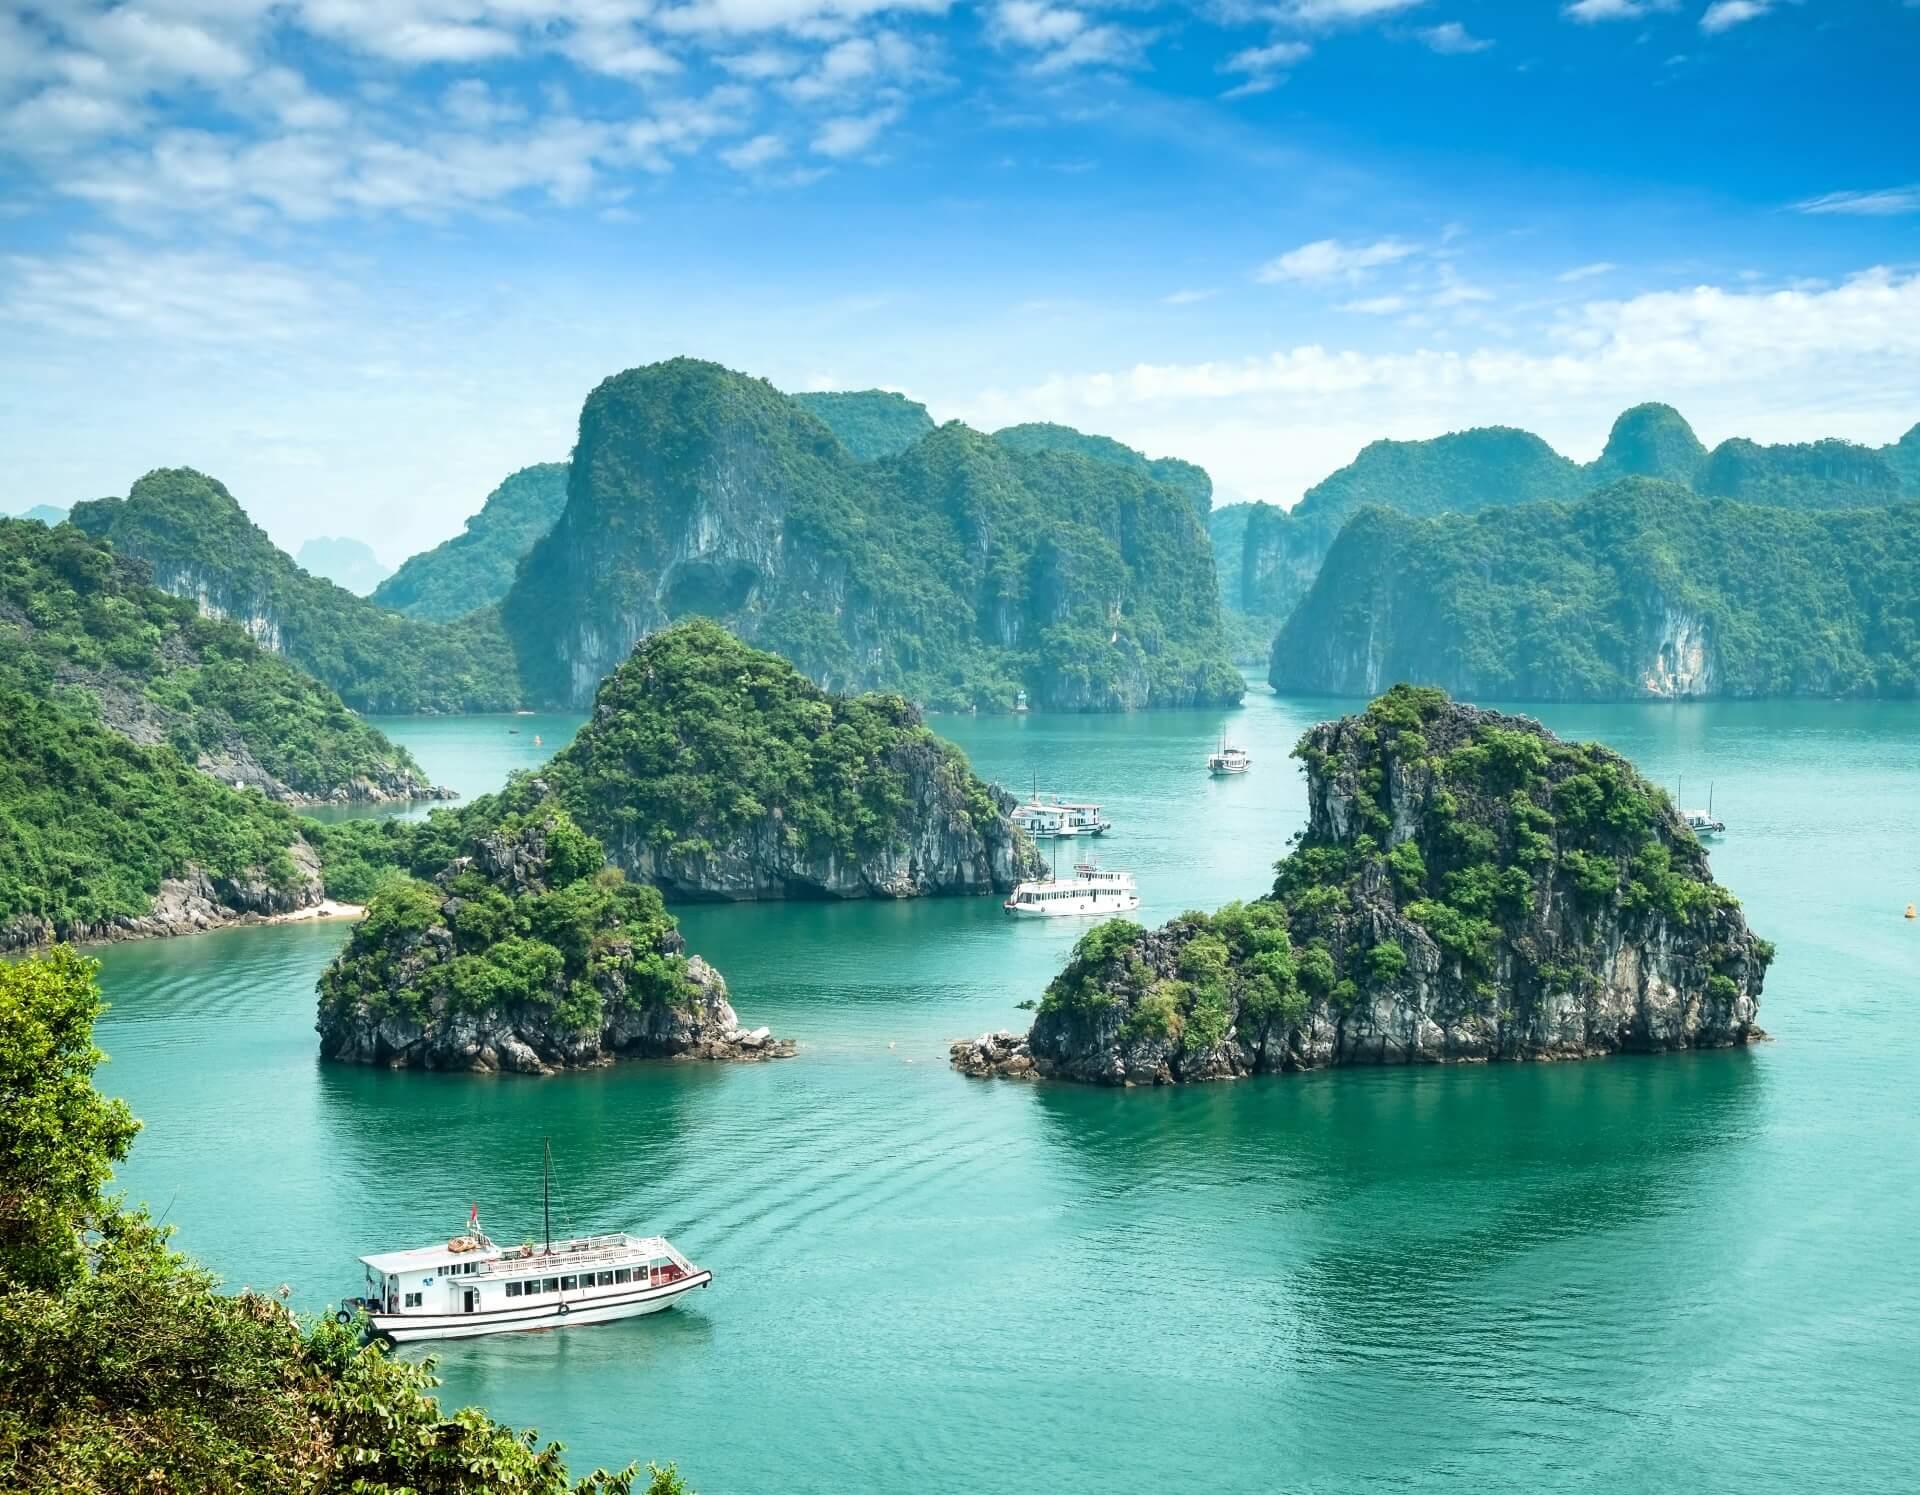 Pauschalreisen-Vietnam-Halong-Bucht